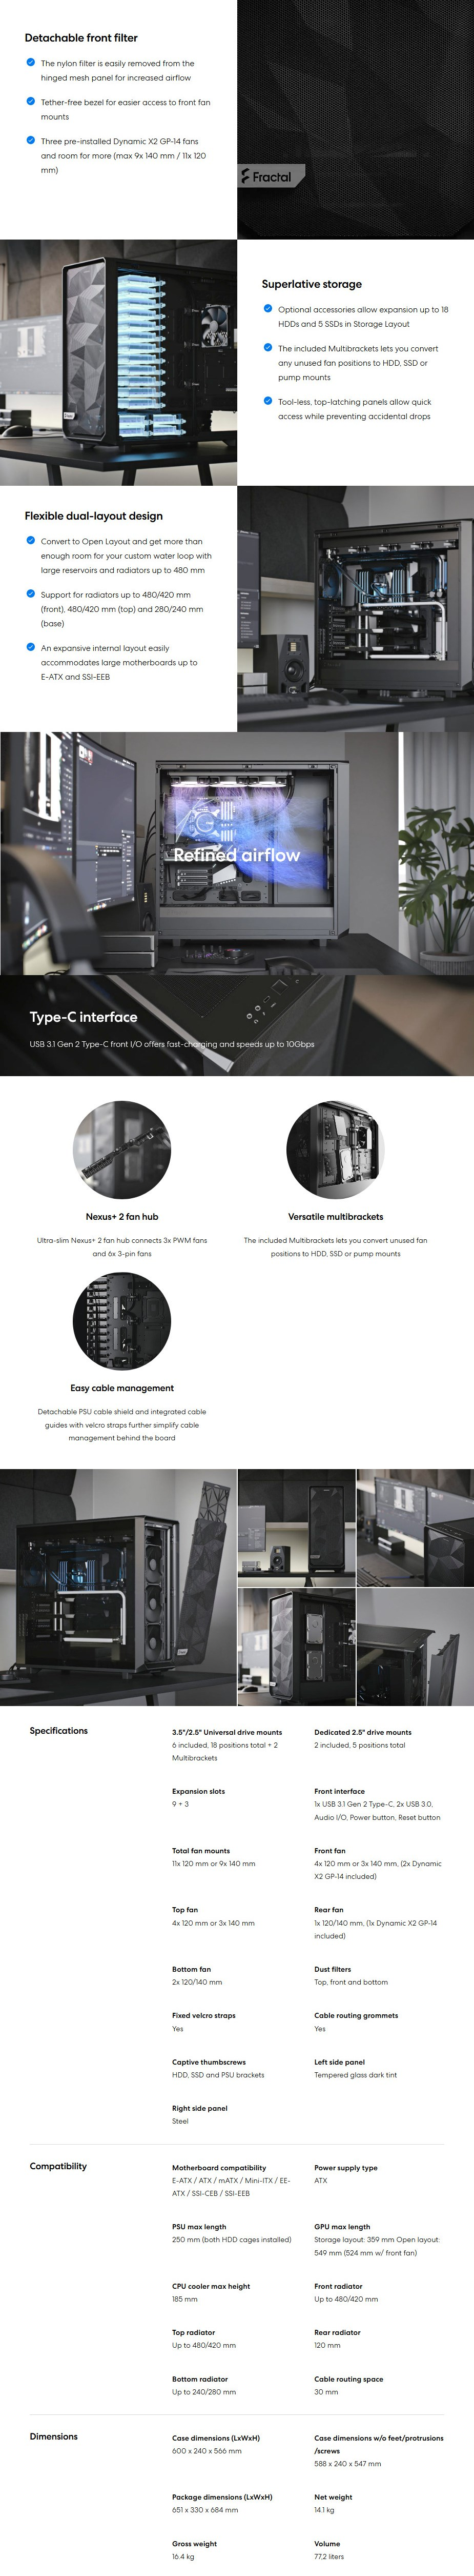 Fractal Design Meshify 2 XL TG Light Tint USB-C Full-Tower E-ATX Case - Black - Overview 1